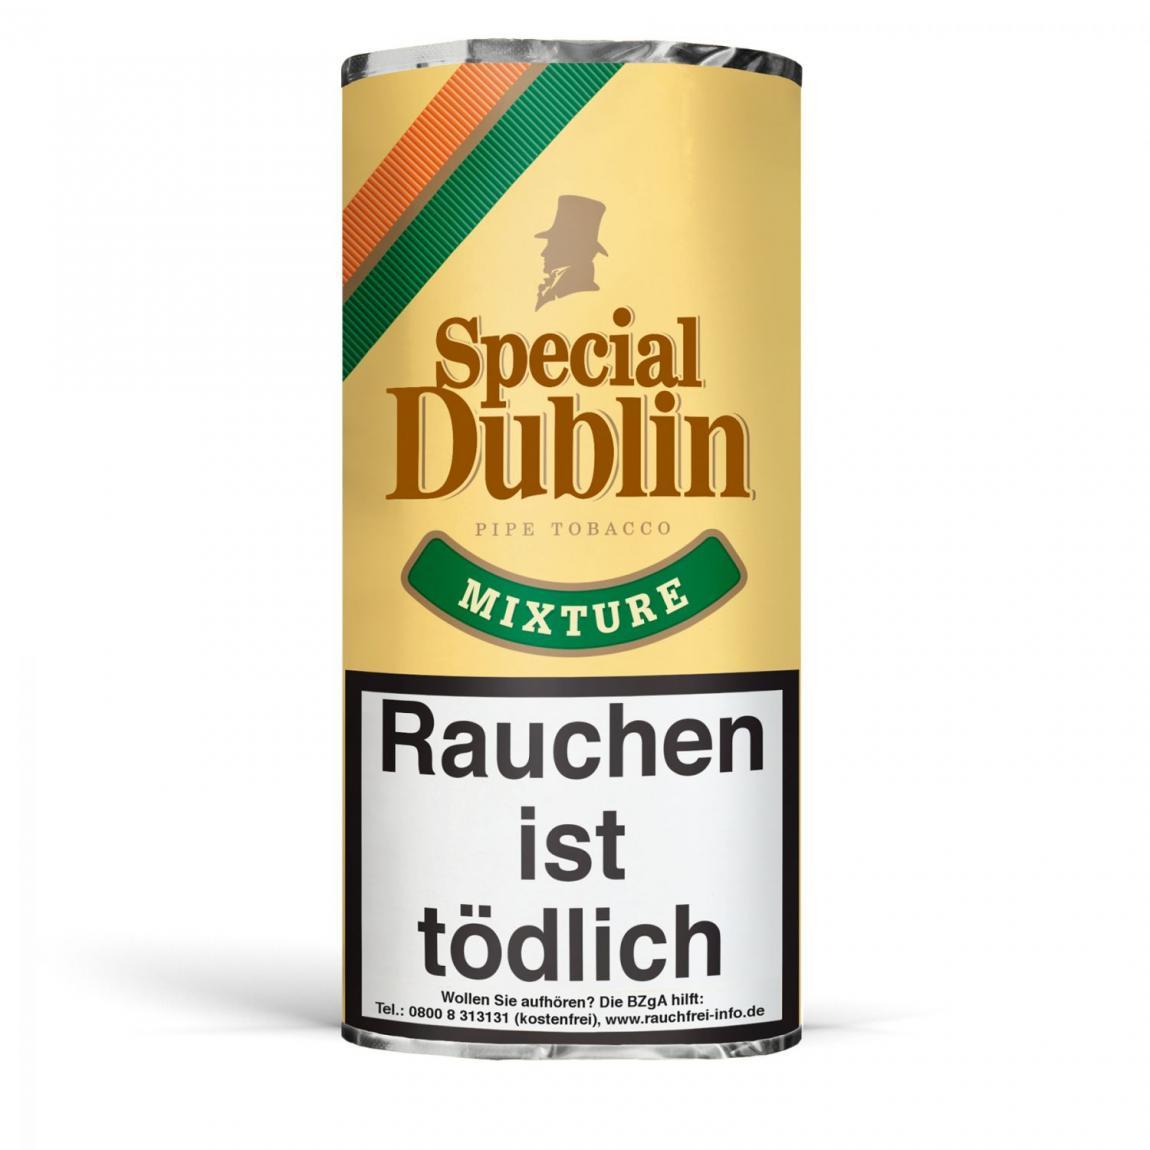 Special Dublin Mixture 50g Pouch